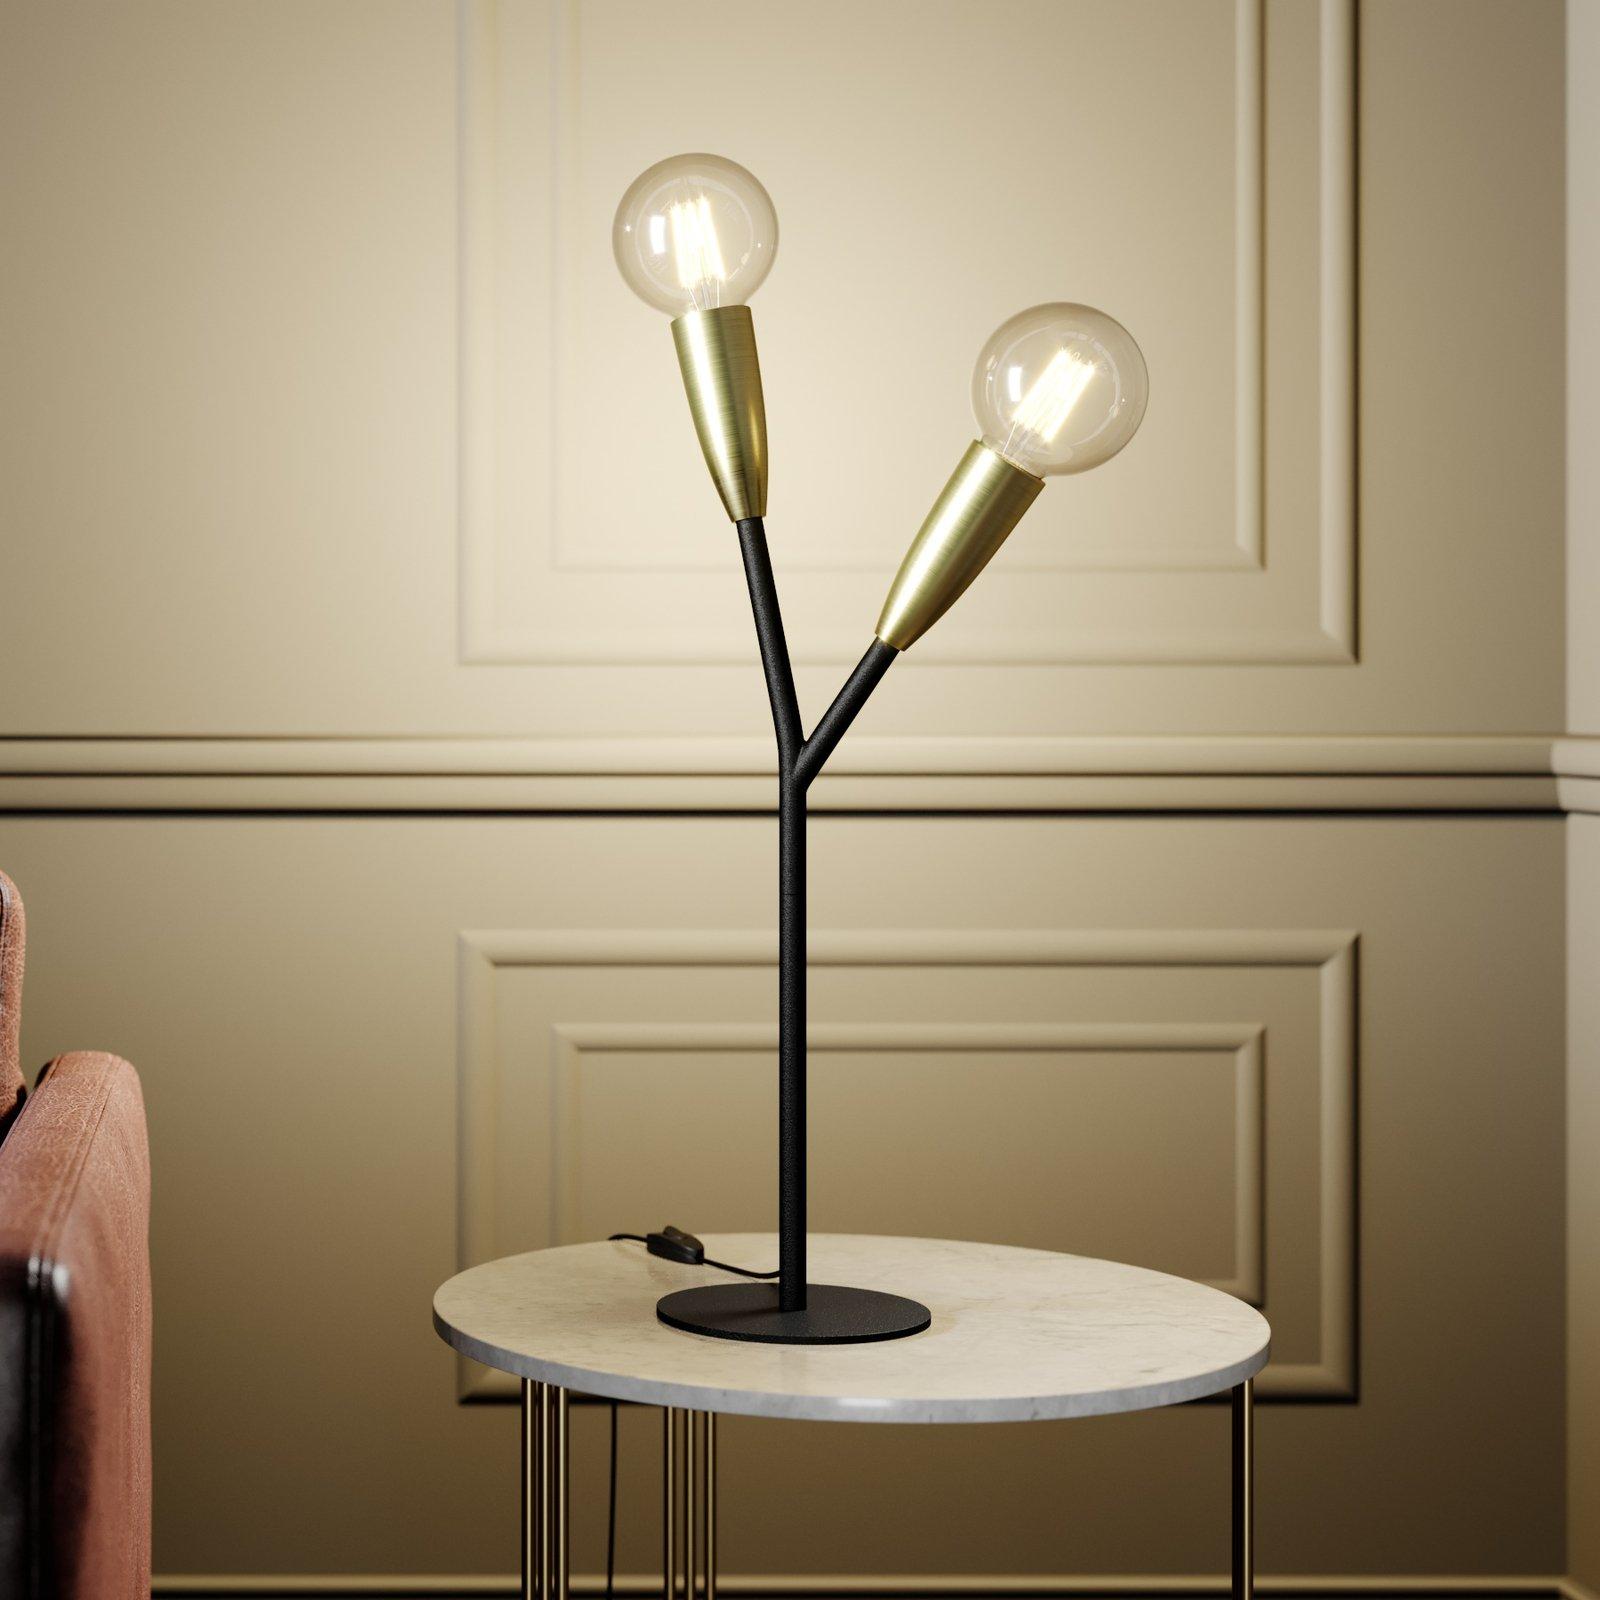 Lucande Carlea bordlampe, 2 lysk., svart messing